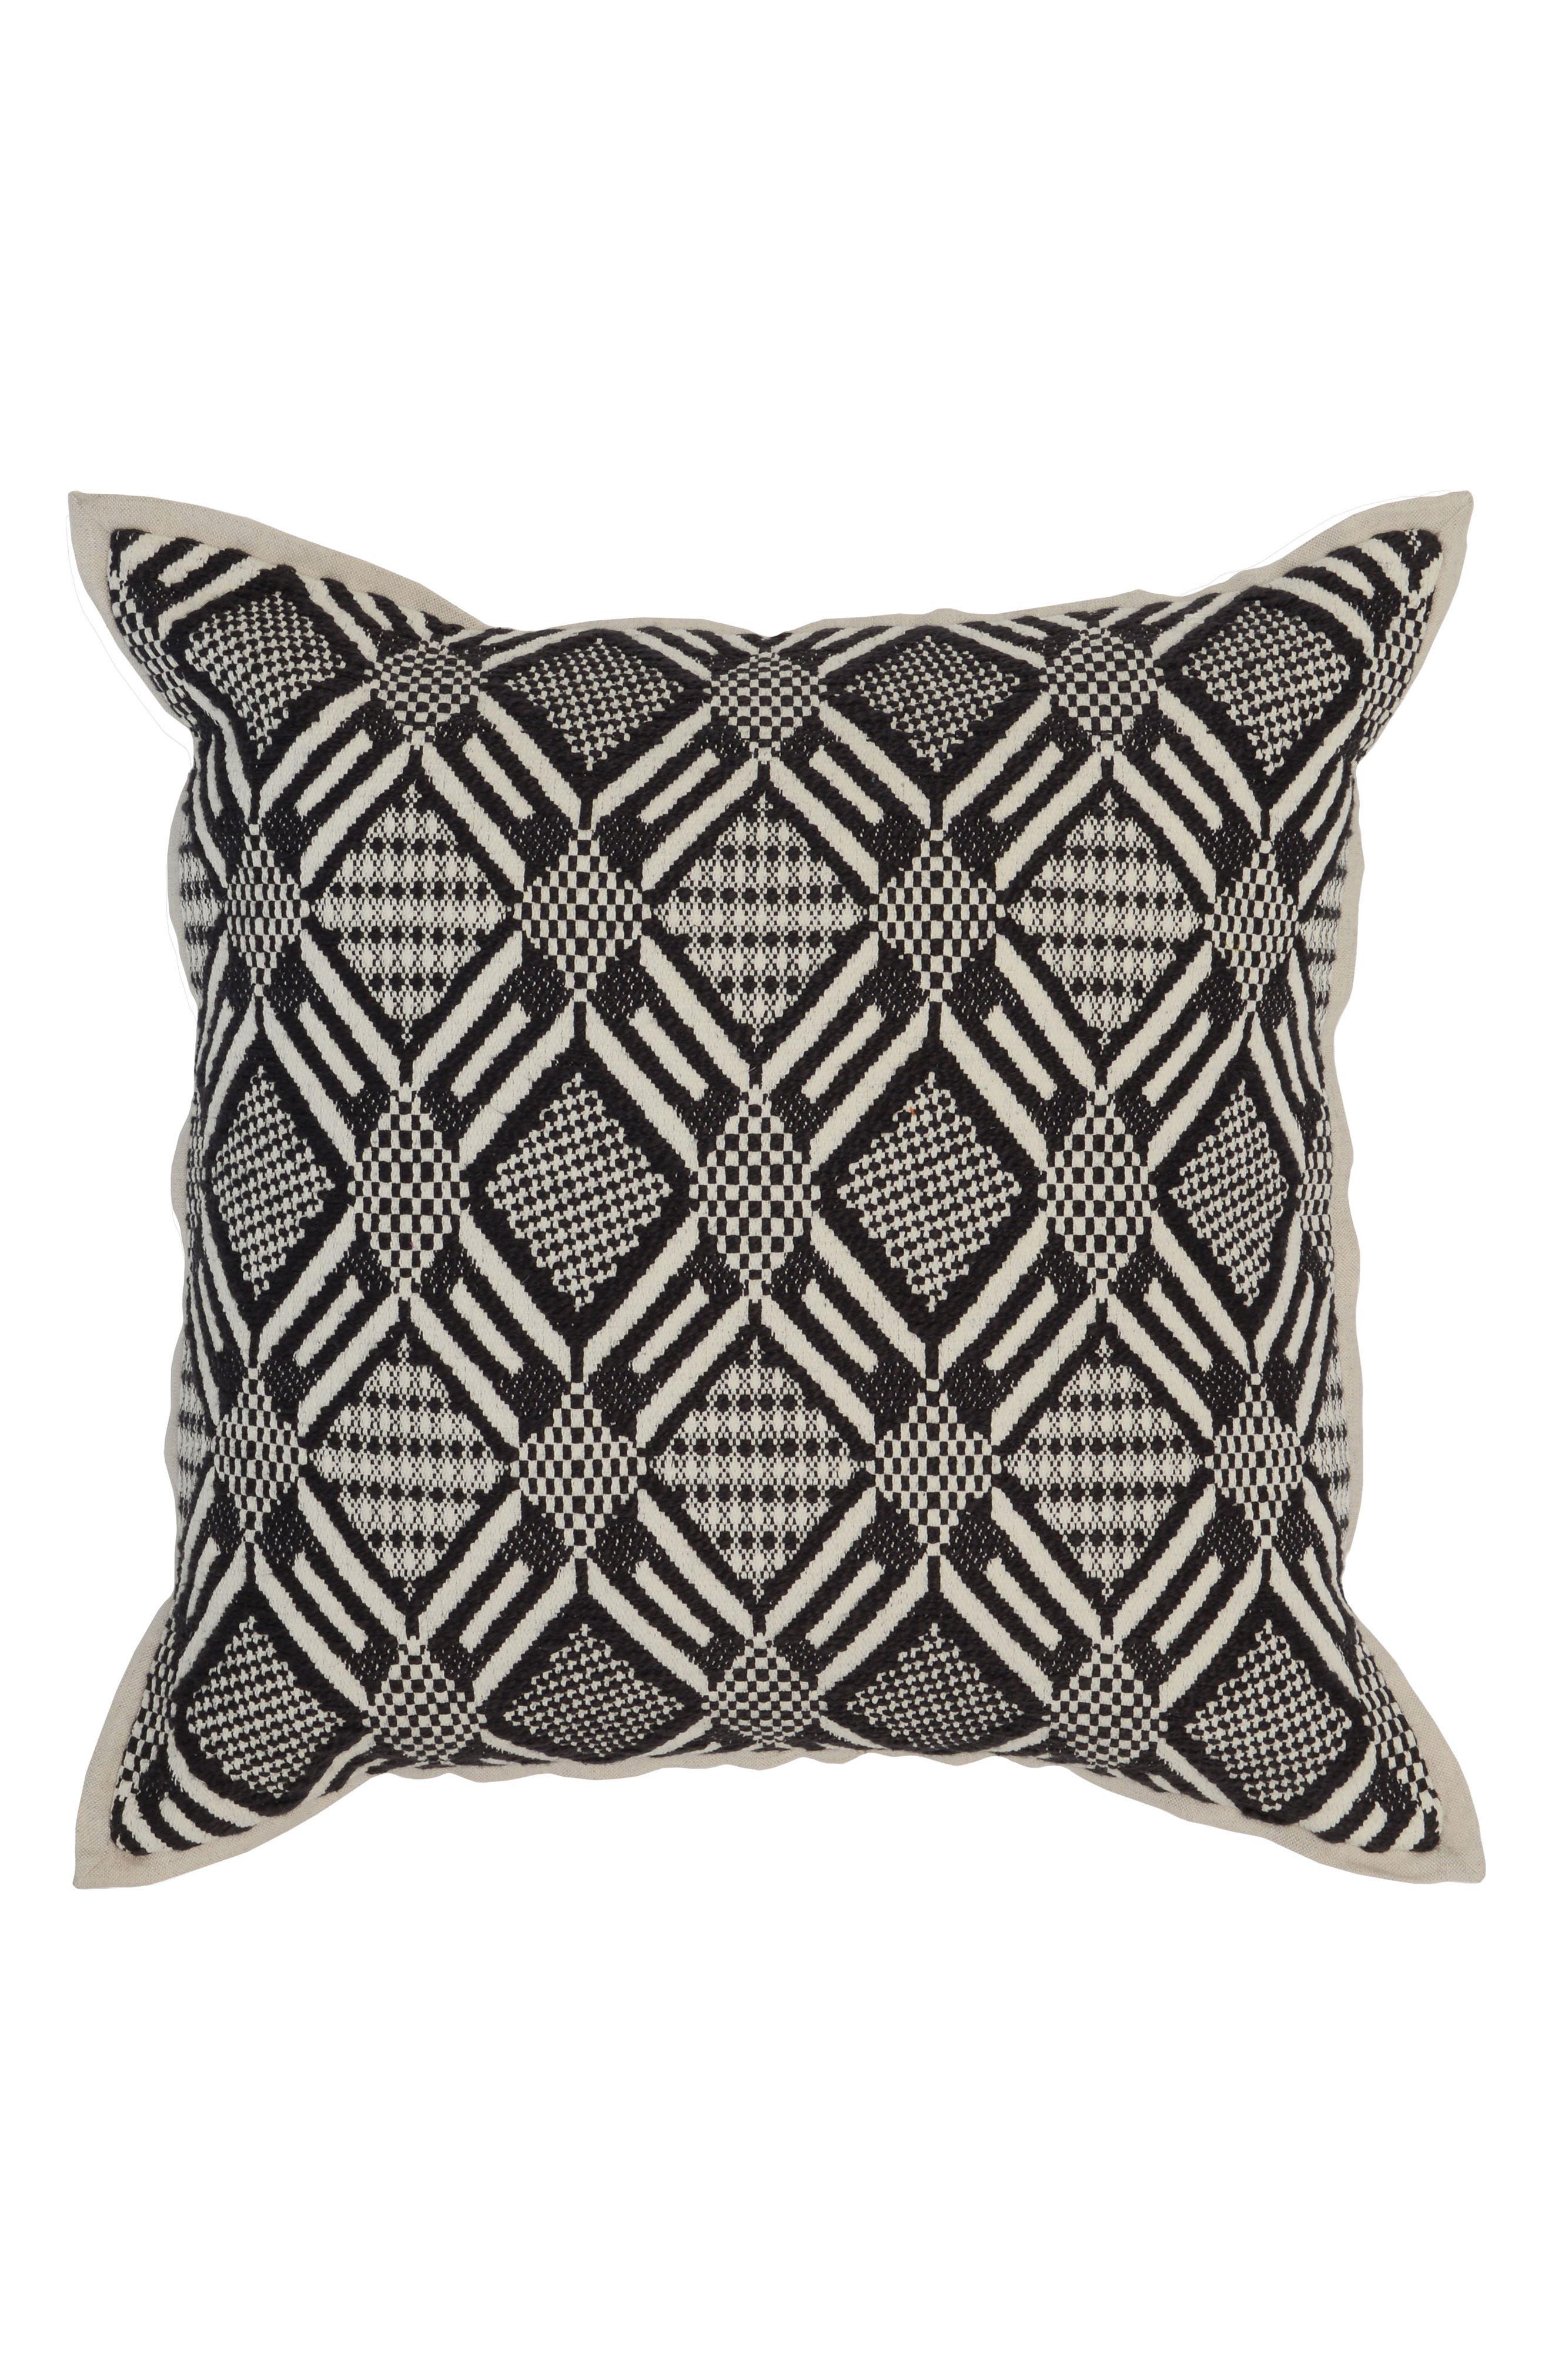 Avila Accent Pillow,                             Main thumbnail 1, color,                             001